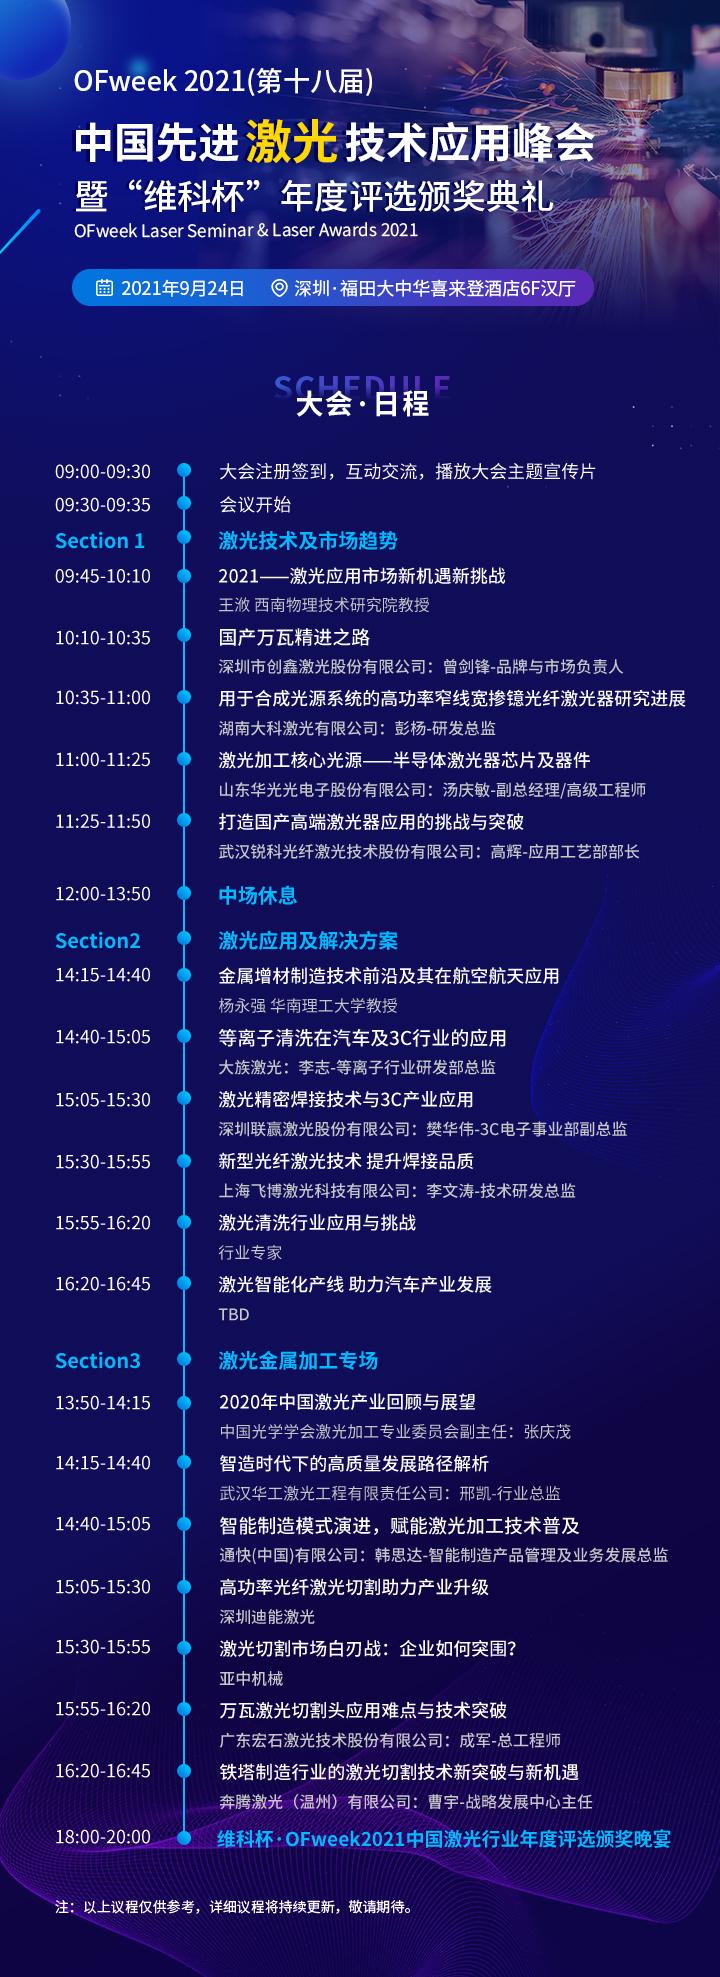 "OFweek 2021(第十八届)先进激光技术应用峰会暨""维科杯""年度评选颁奖典礼"